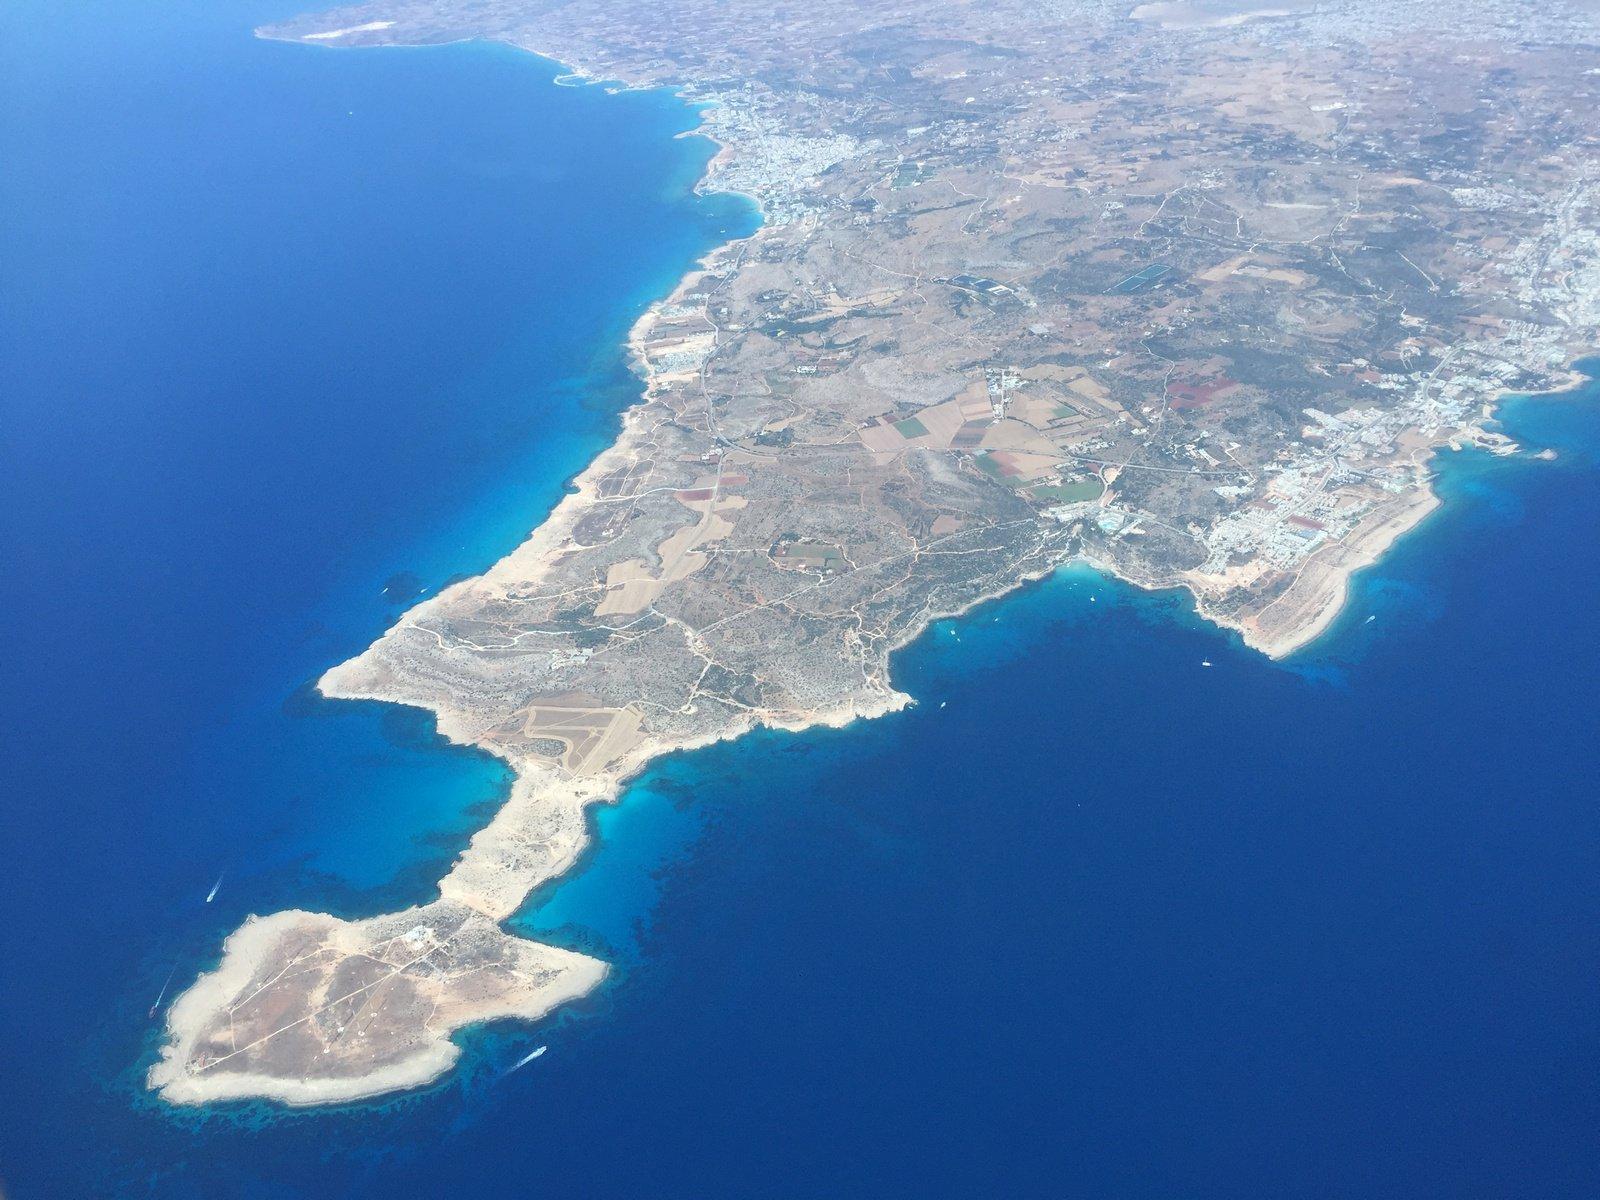 Вид на Кипр перед посадкой в аэропорту Ларнака